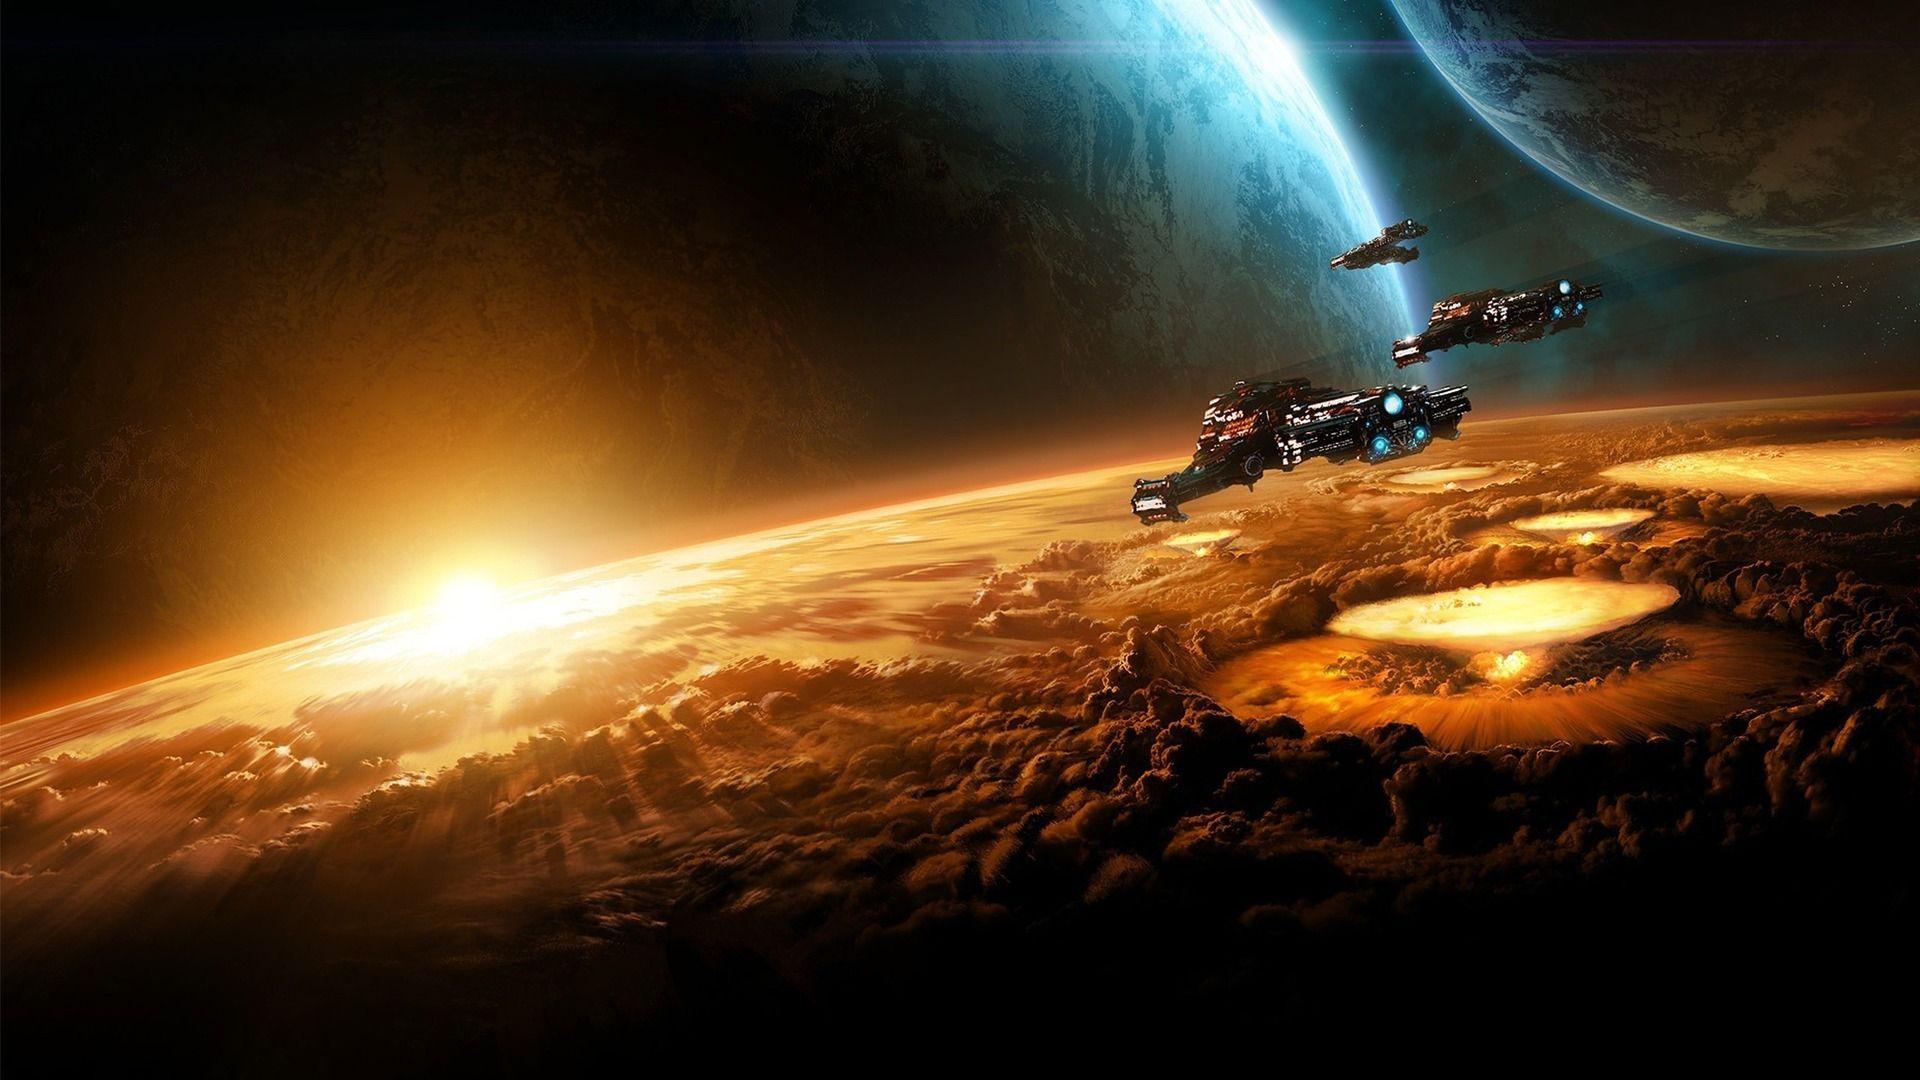 Sci Fi Desktop Backgrounds: Sci Fi Wallpaper Hd 3564